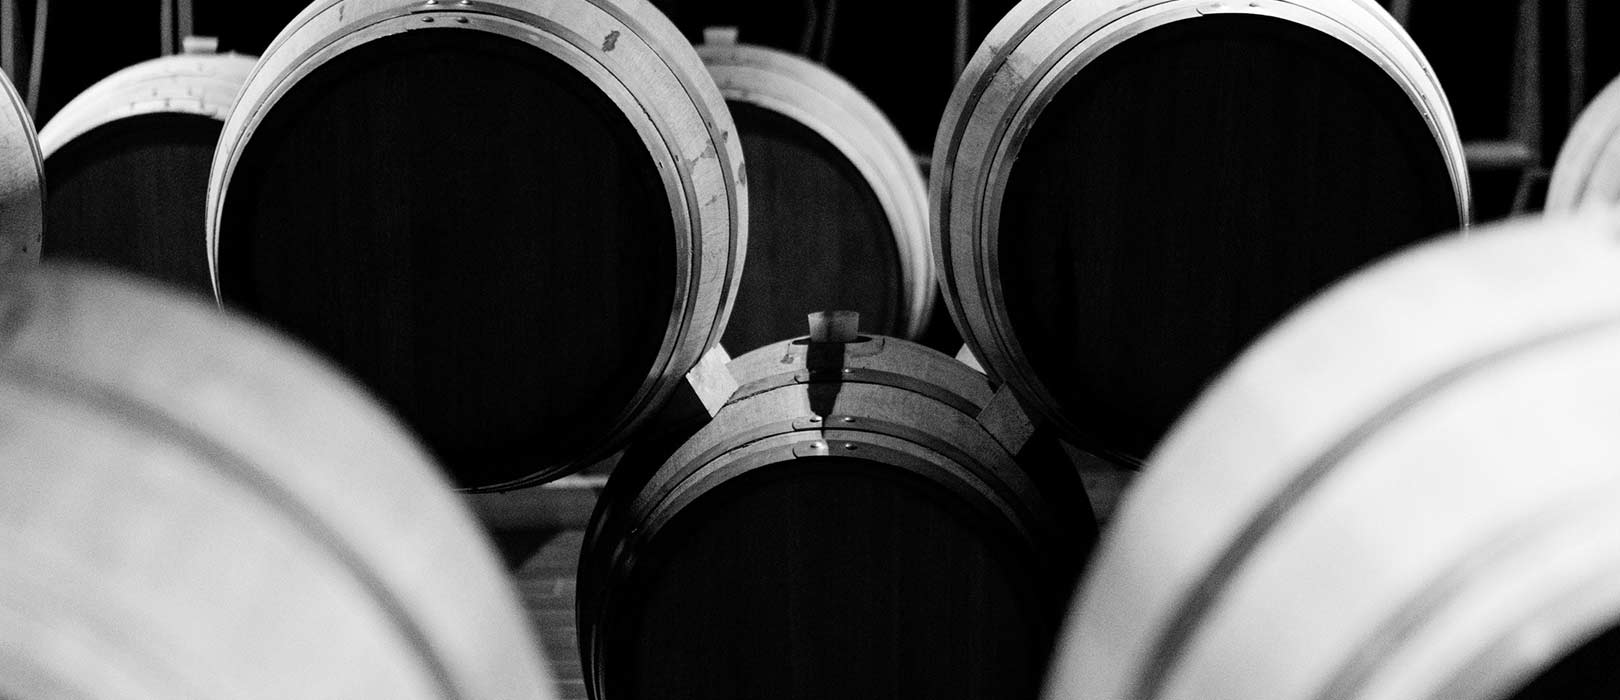 baric Domeniile Blaga Cumpara vin online